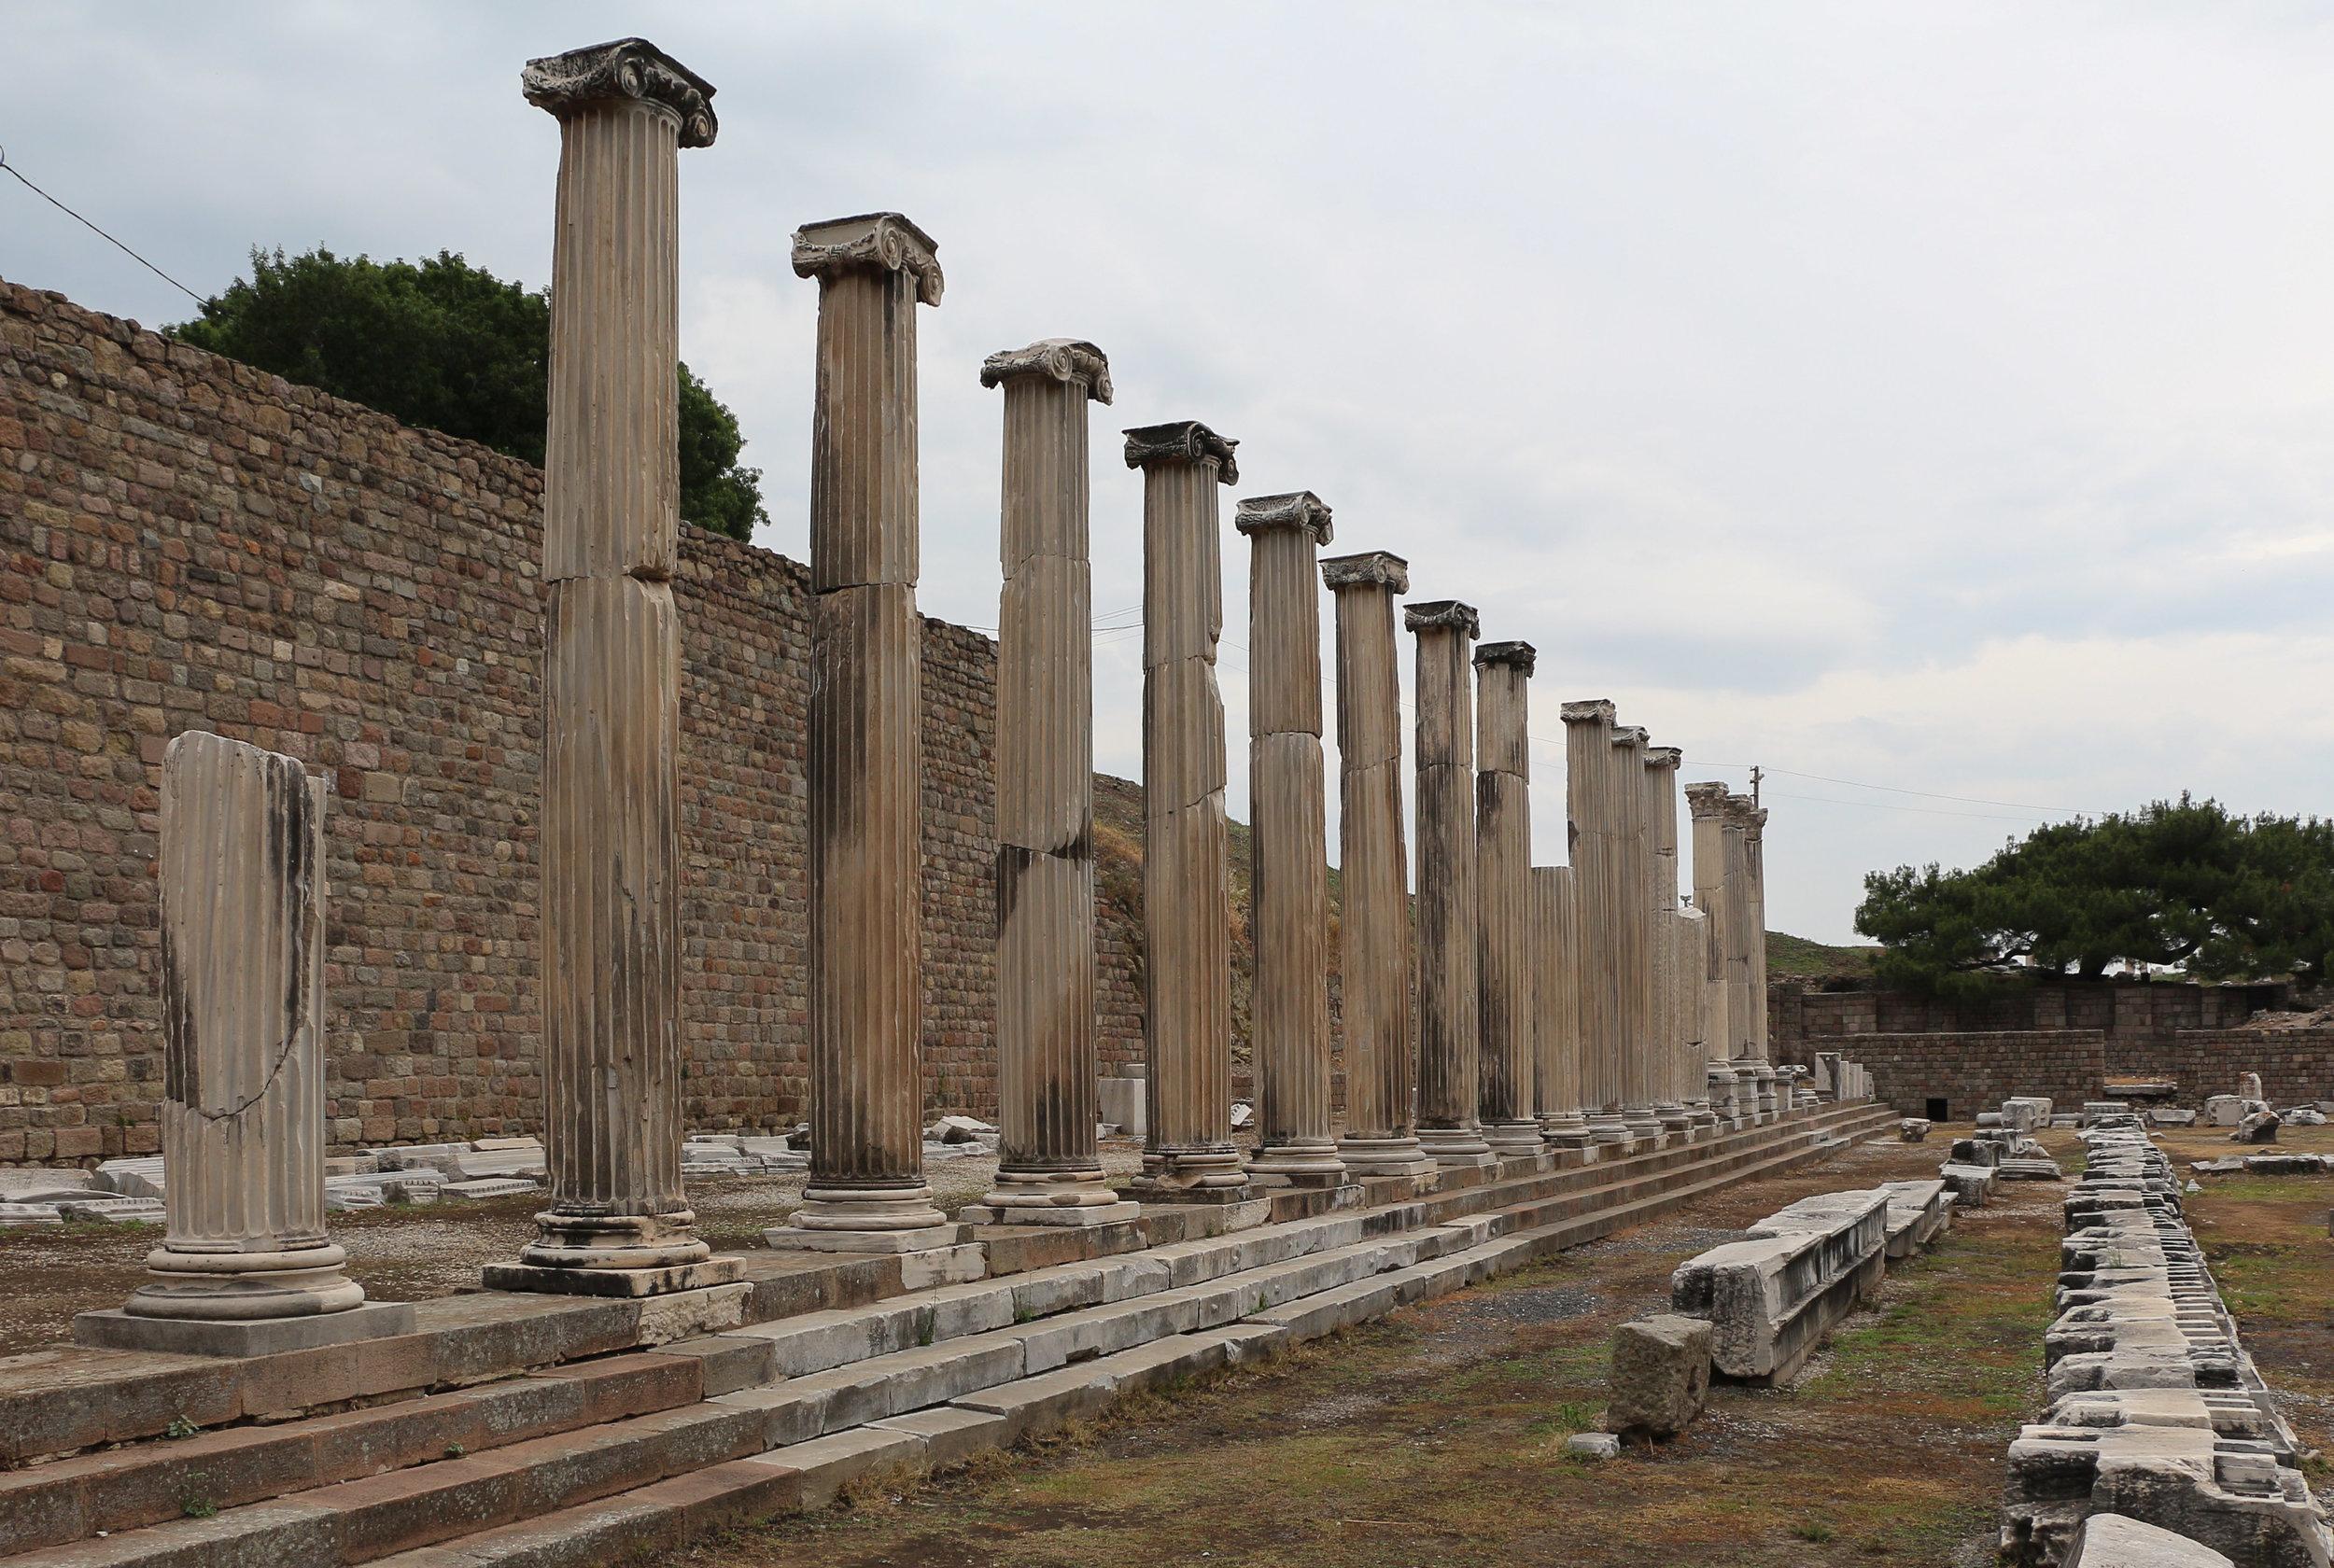 North_Stoa_at_Pergamon_Asclepium_03.jpg